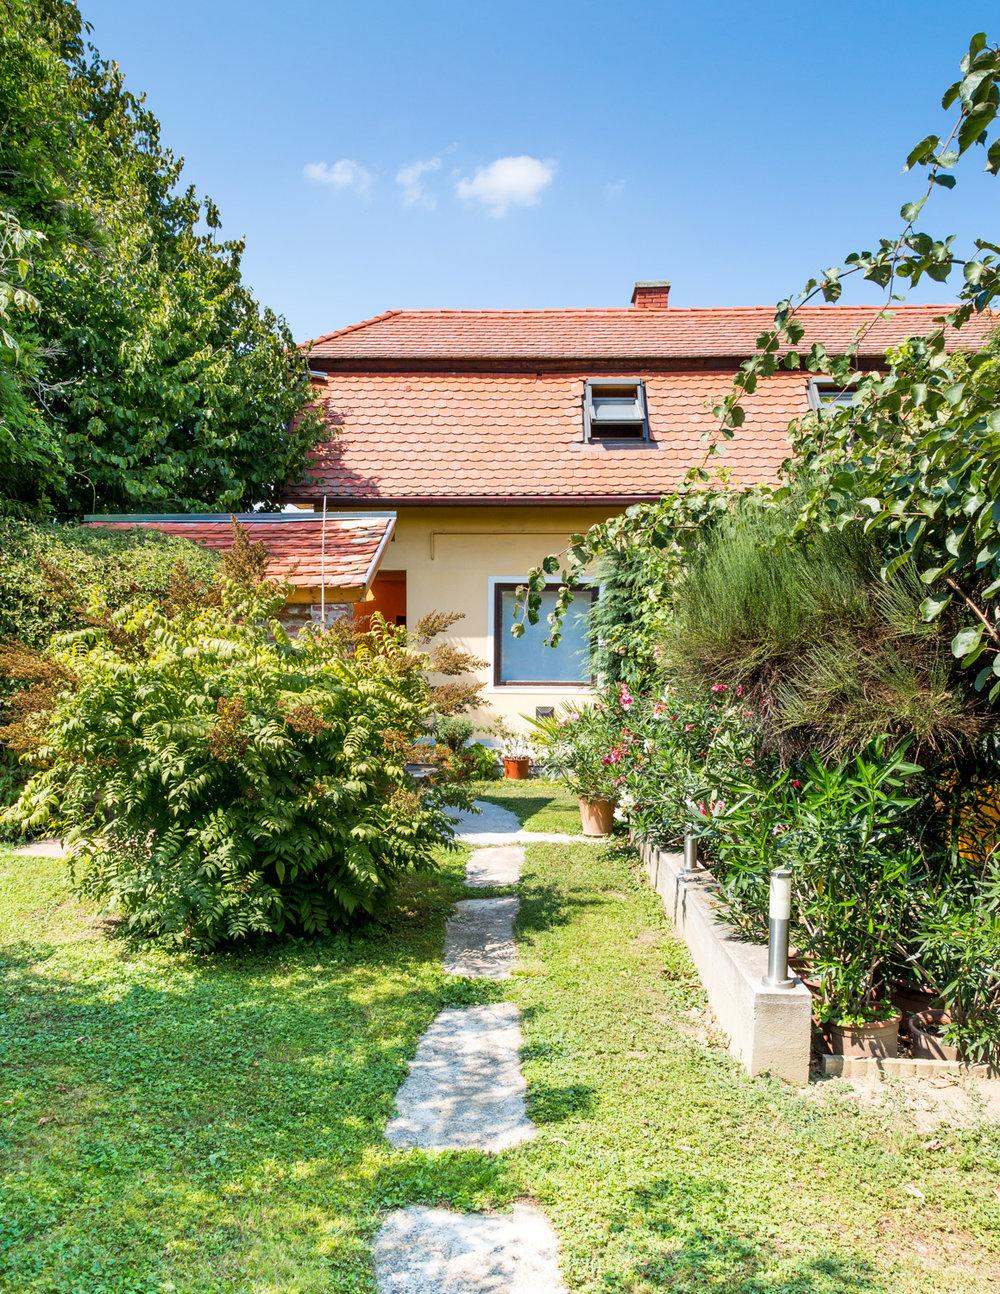 Garden_house.jpg